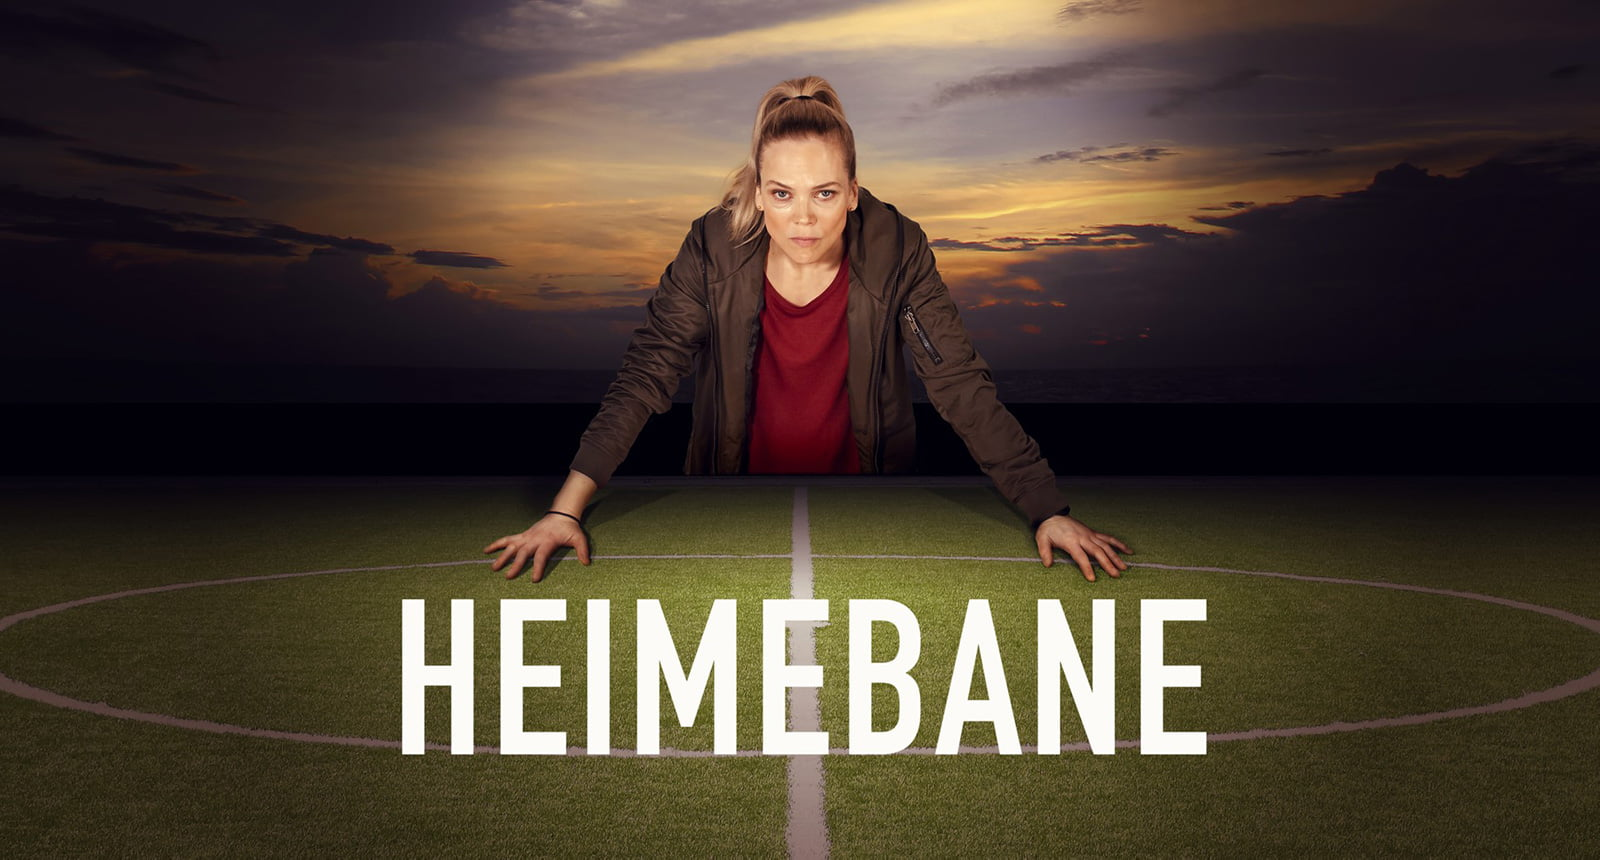 Heimebane Home Ground